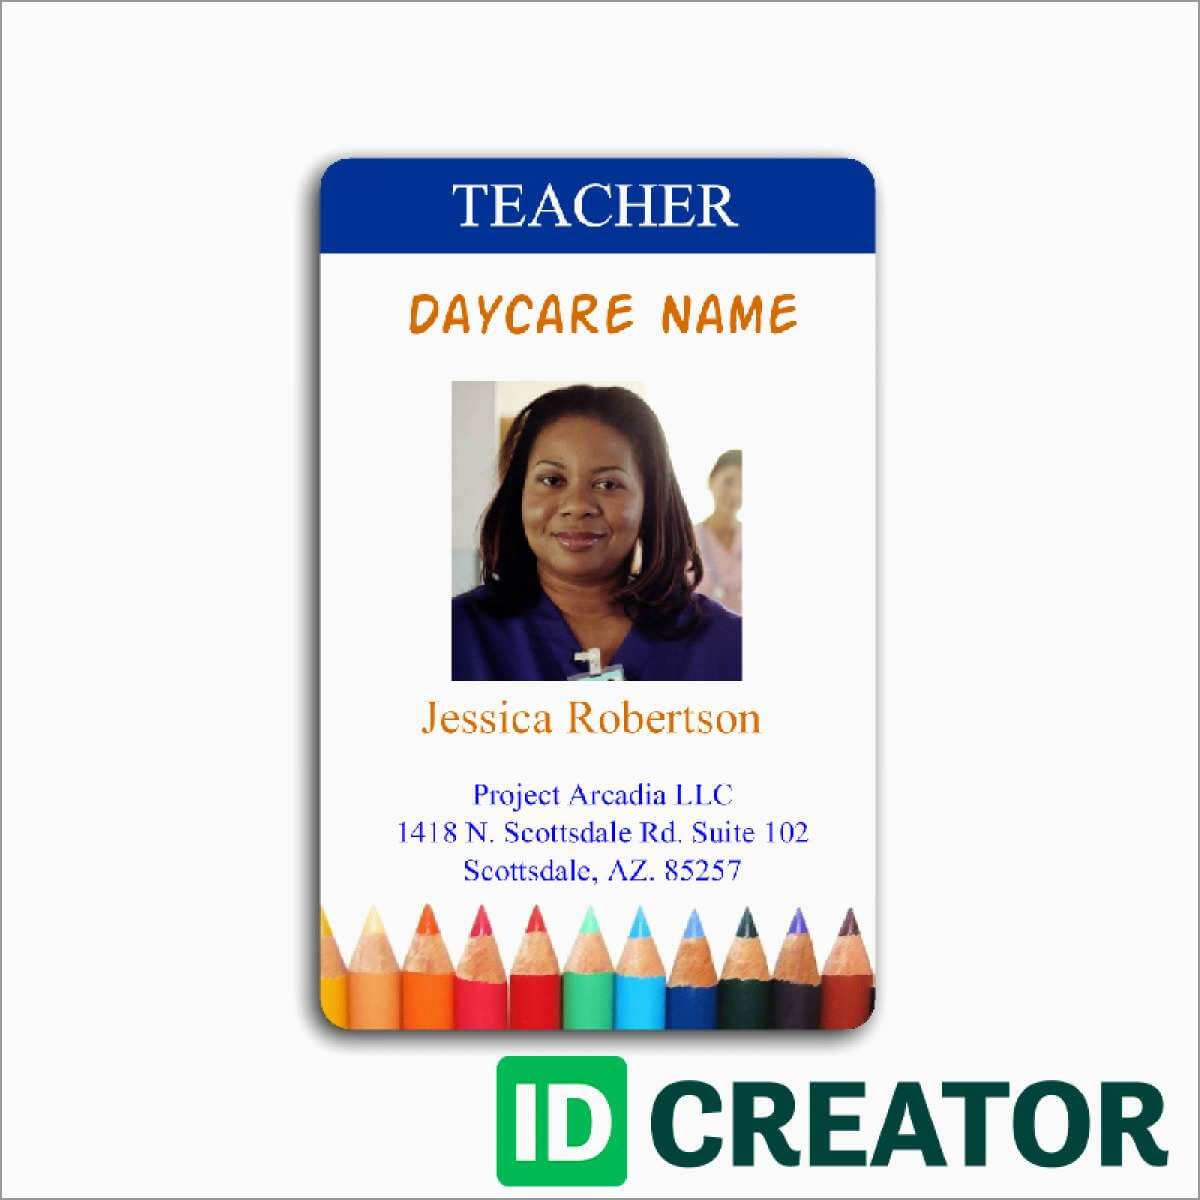 023 Teacher Id Card Photoshop Template Ideas Free Great Pertaining To Teacher Id Card Template